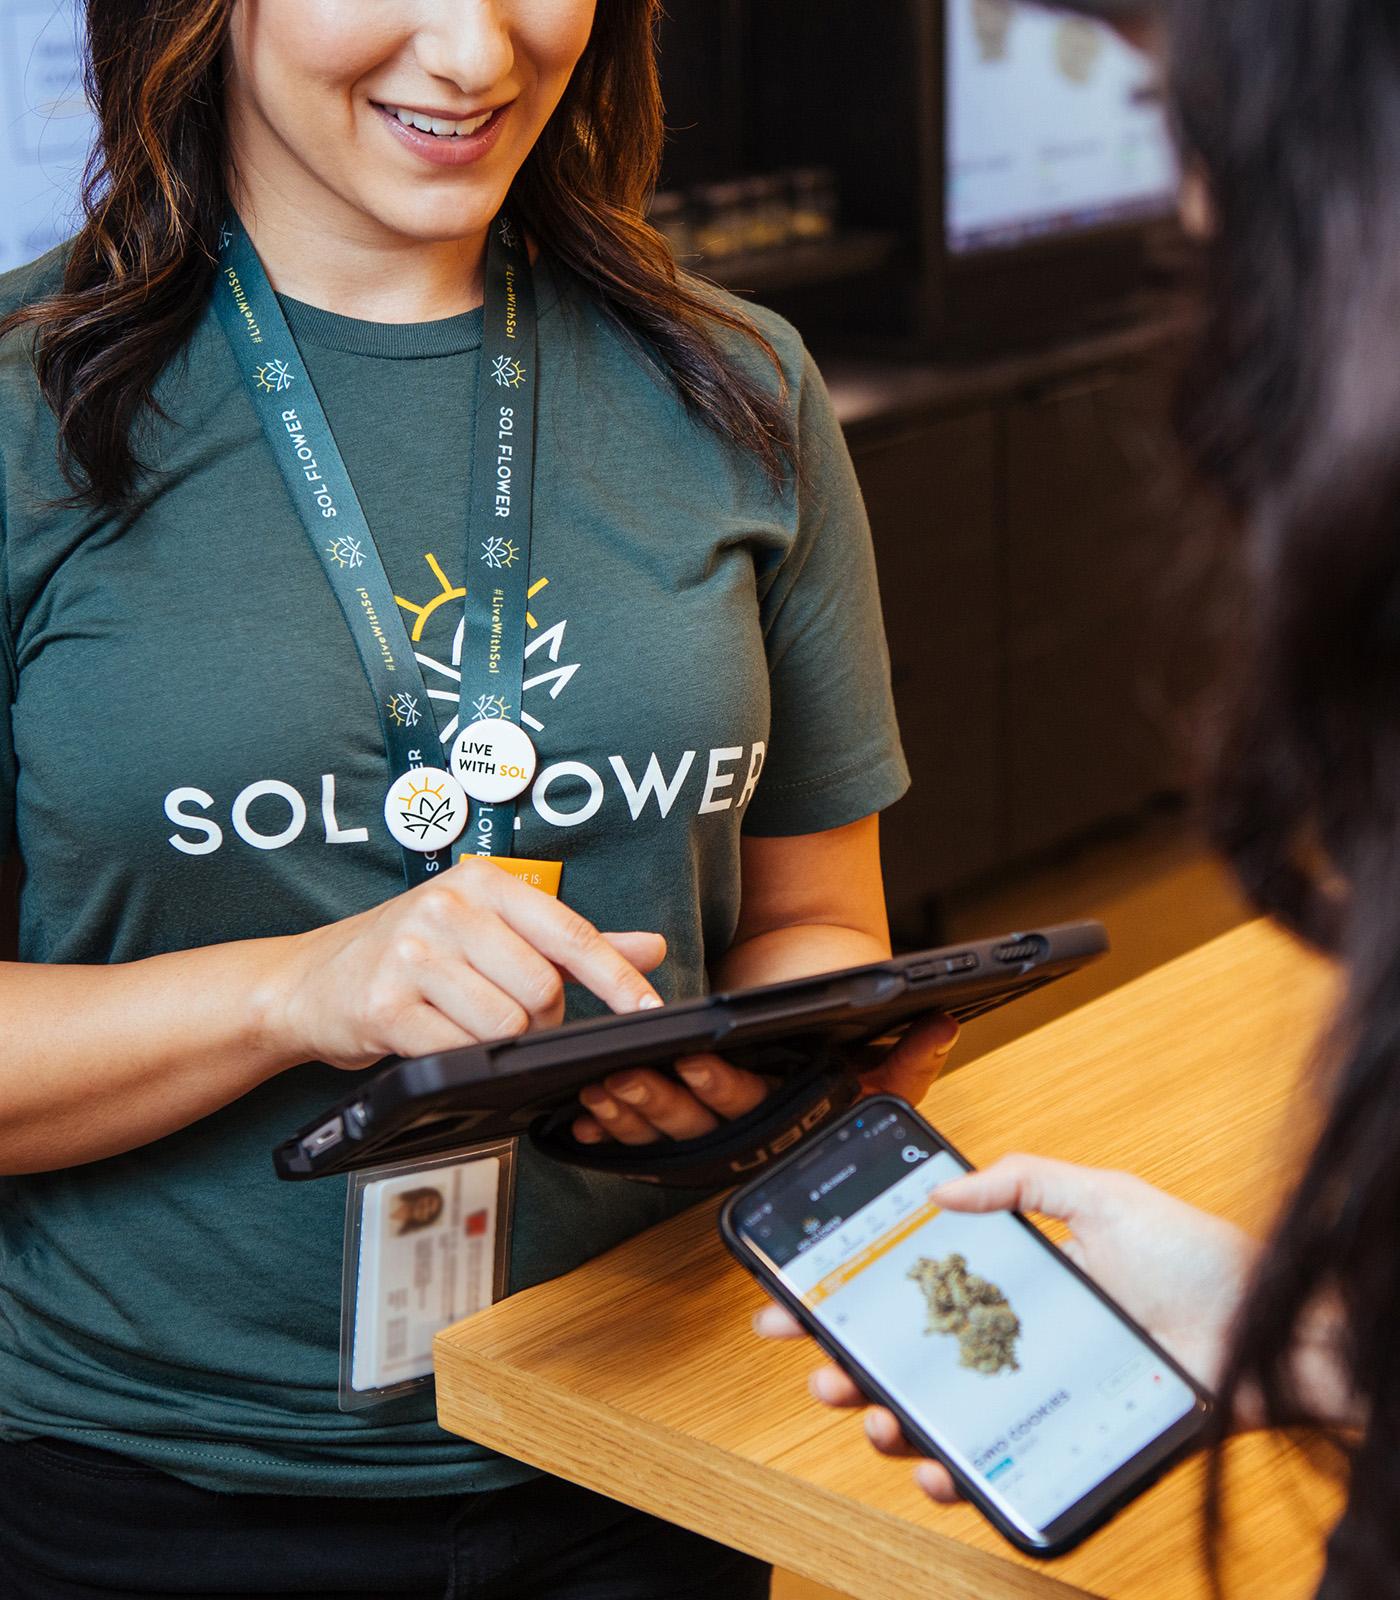 SolFlower Employee